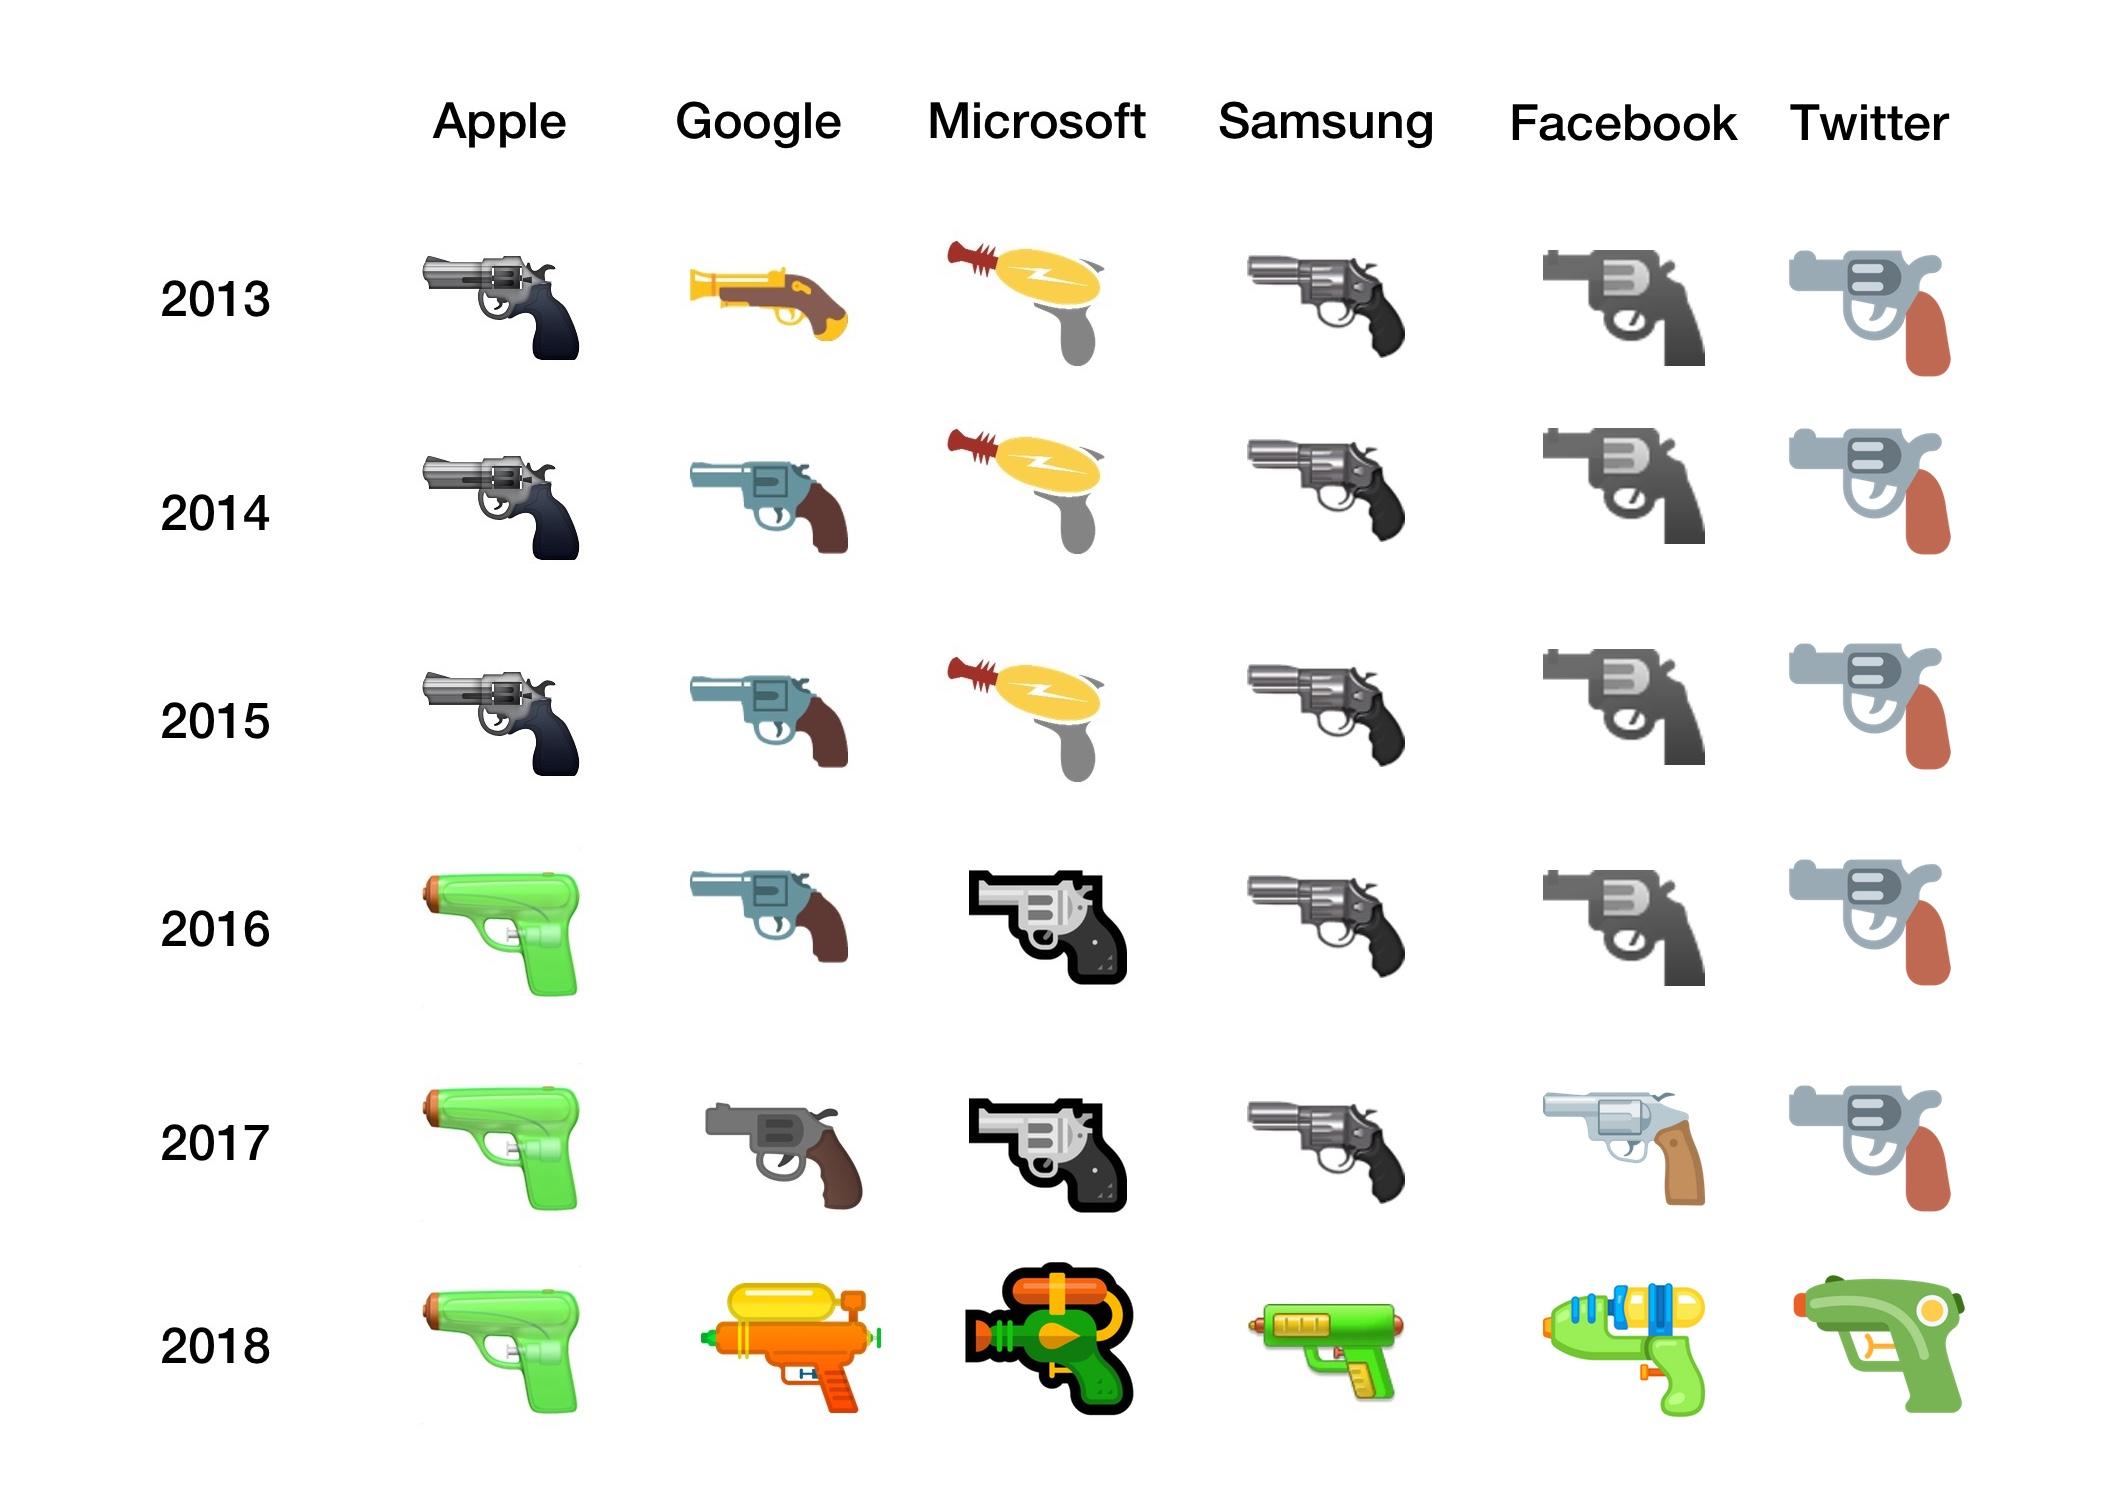 google-pistol-emojis-emojipedia-2012-2018-updated-microsoft-facebook-1